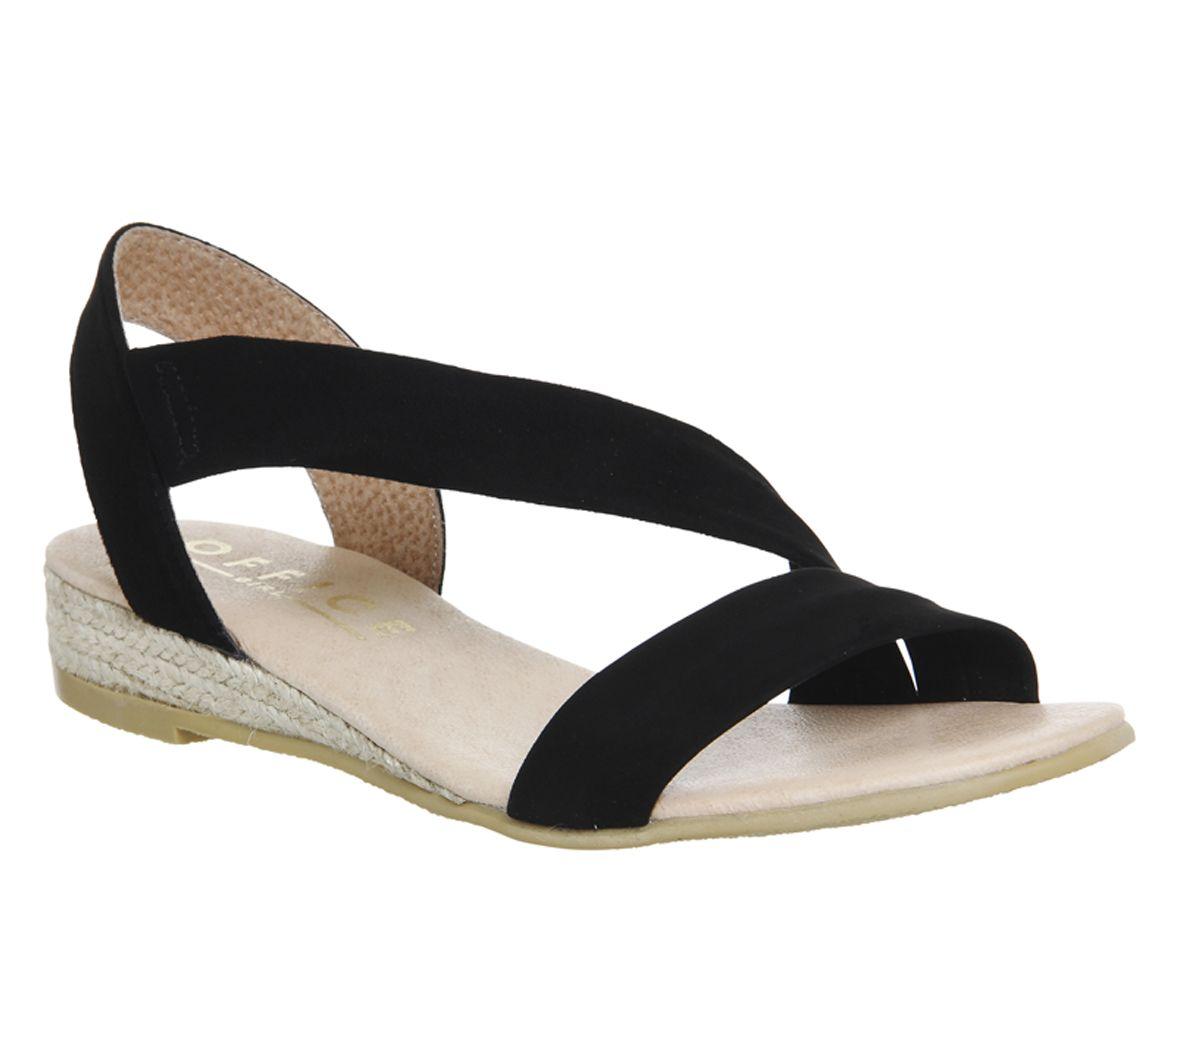 e29f383d3834 Office Heidi Espadrille Sandals Black Suede - Sandals